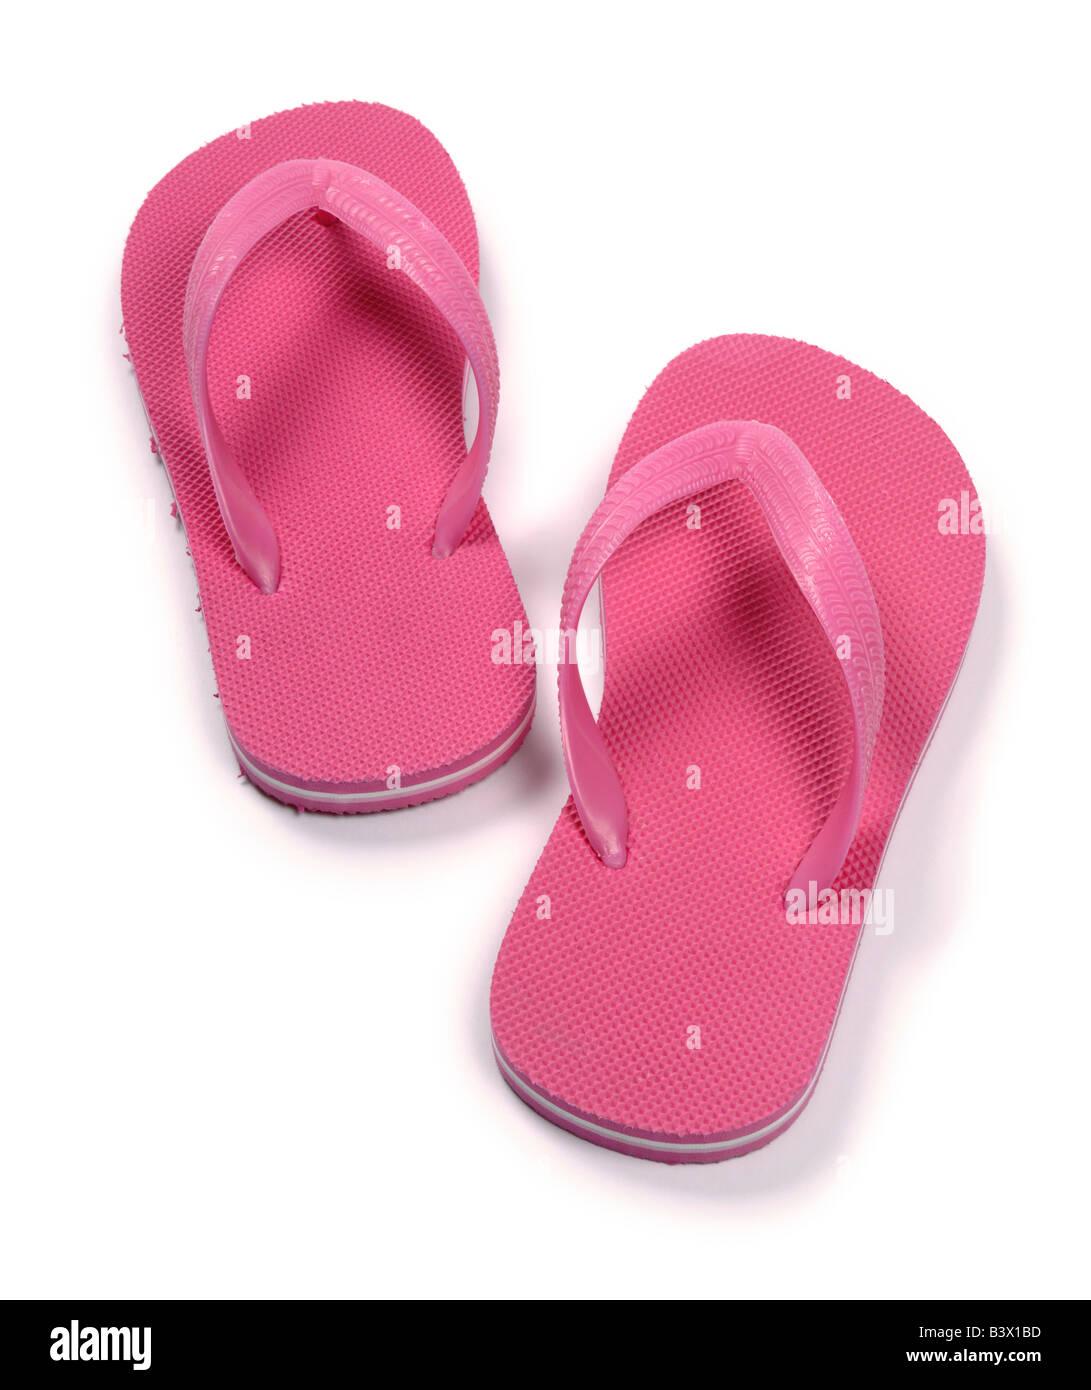 Infradito rosa Foto Stock